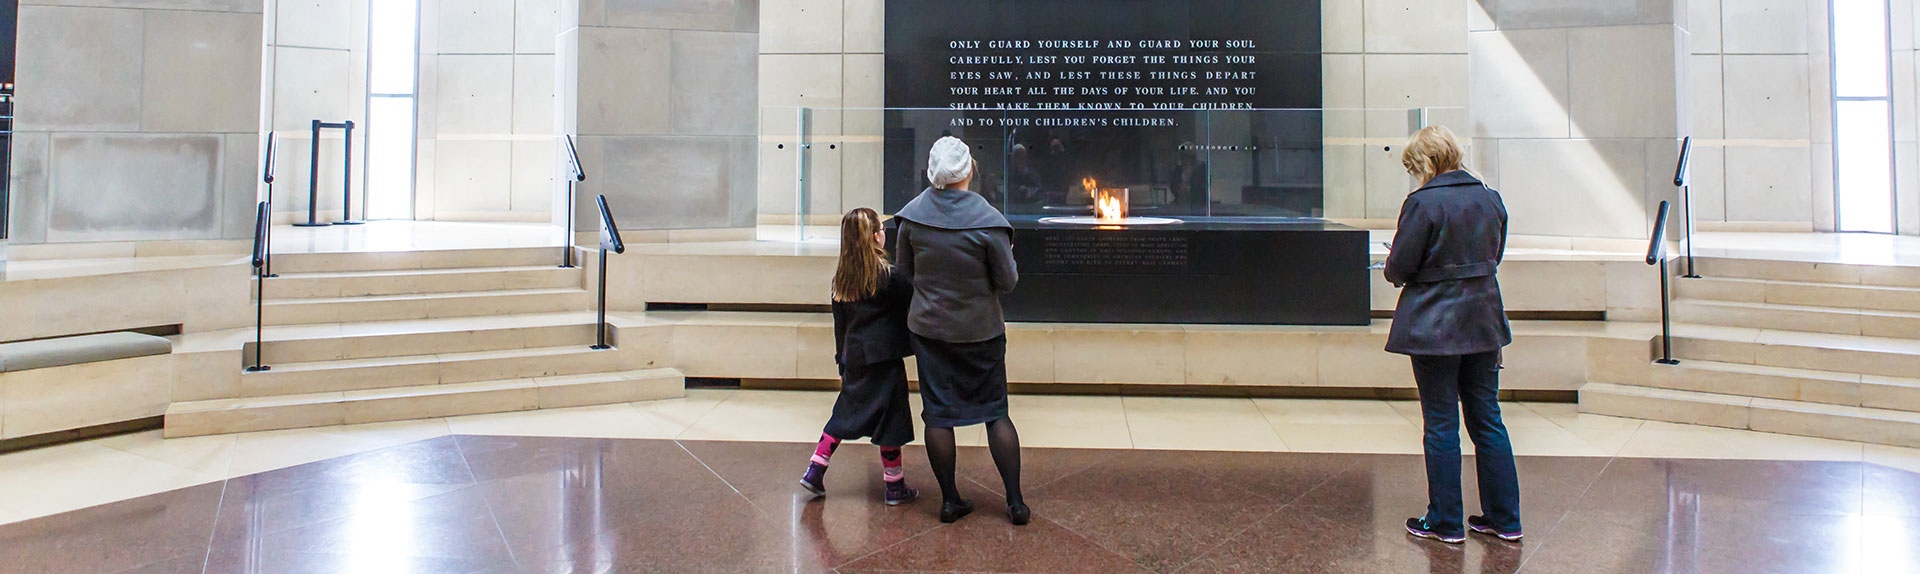 US Holocaust Memorial Museum in Washington, District of Columbia